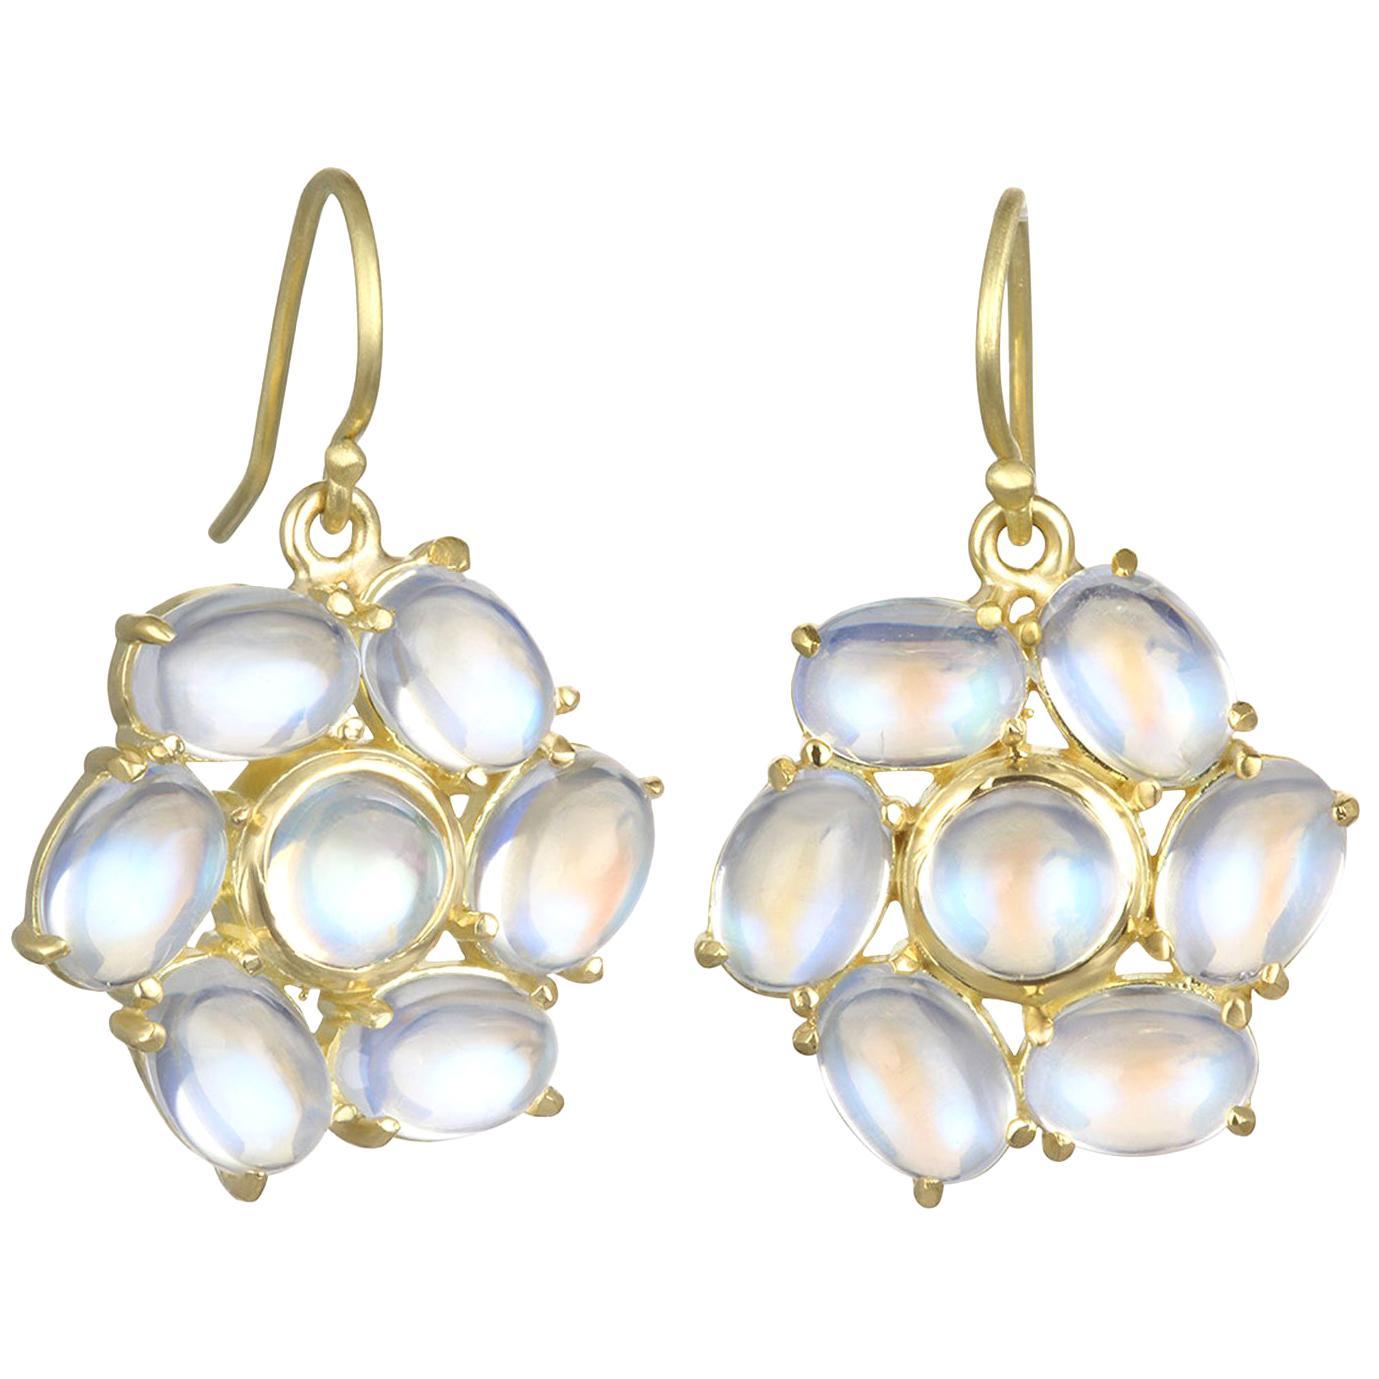 Faye Kim 18 Karat Gold Ceylon Moonstone Daisy Earrings